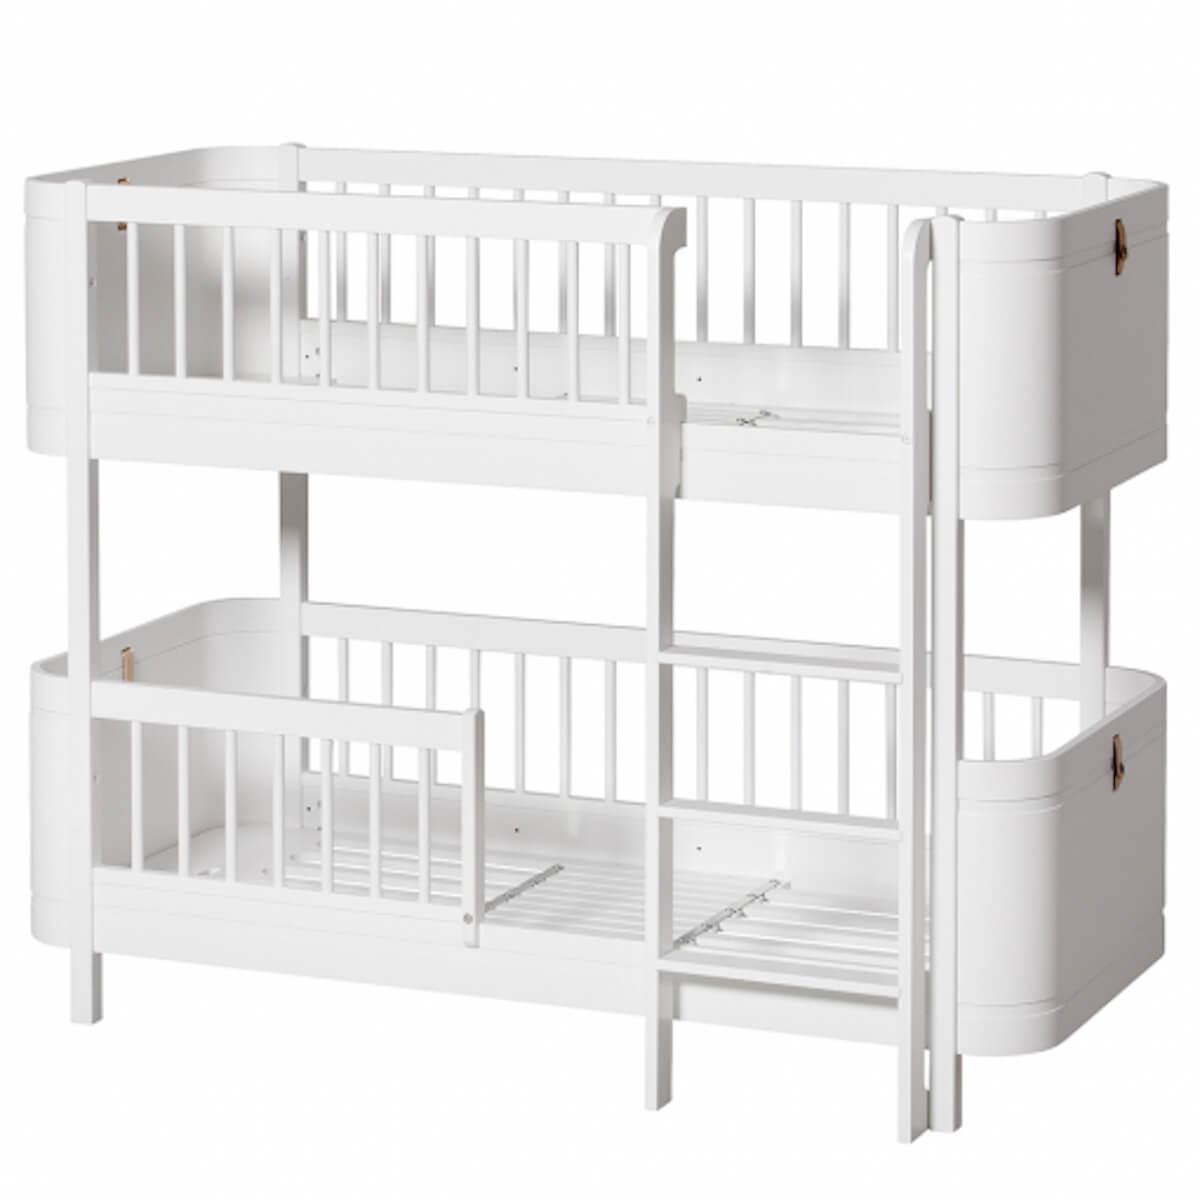 Lit superposées 68x162cm WOOD MINI+ Oliver Furniture blanc